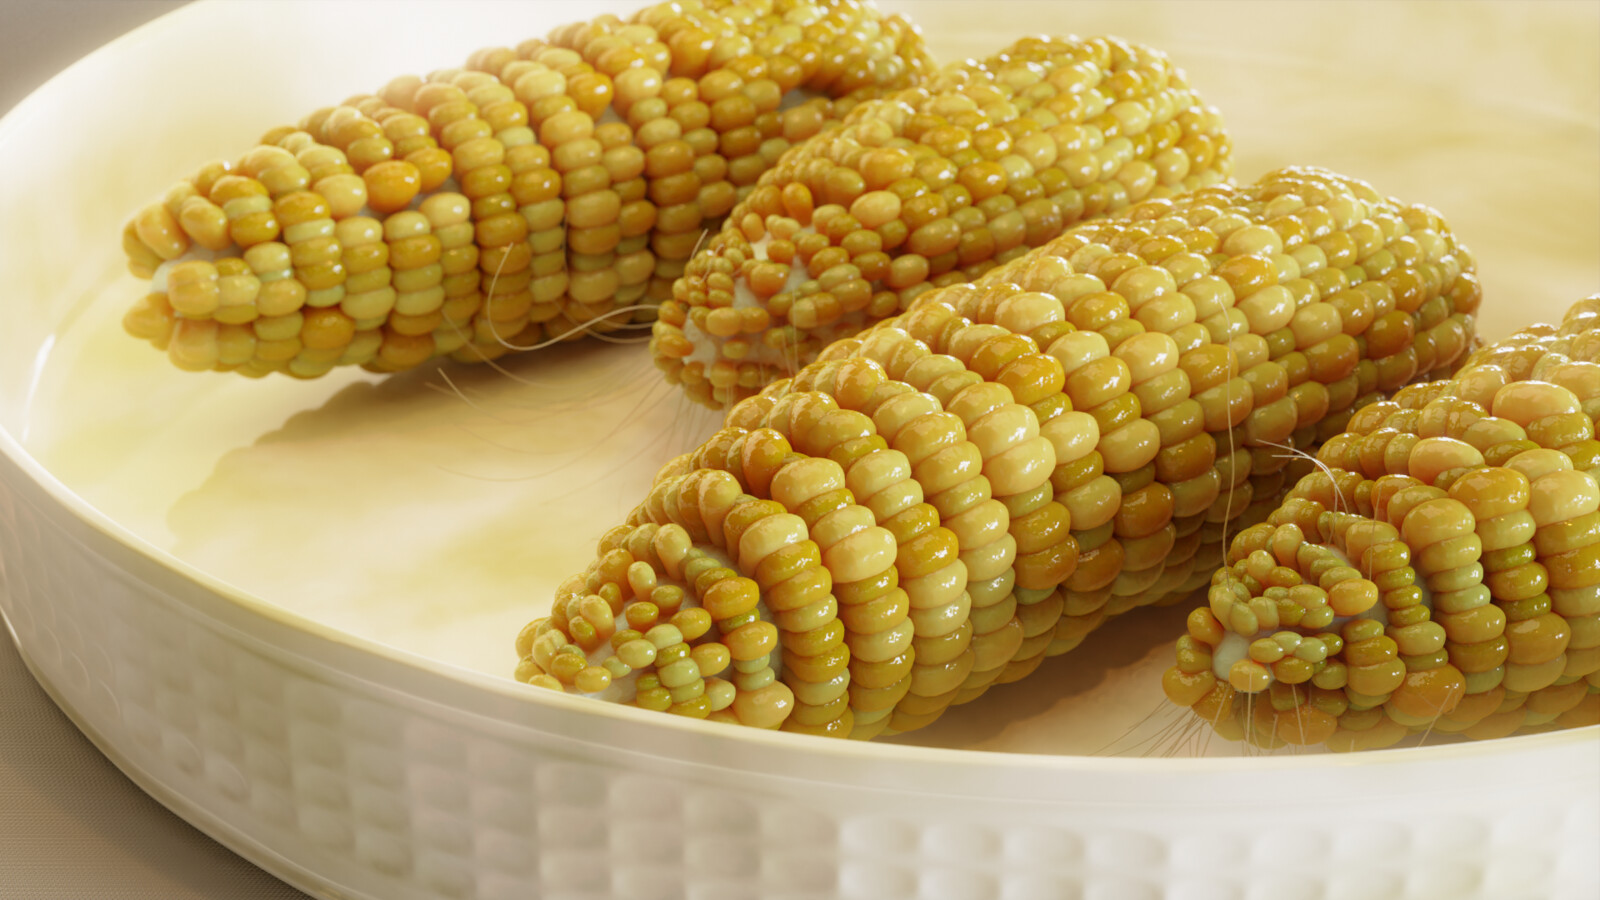 Corn Cobs in Blender